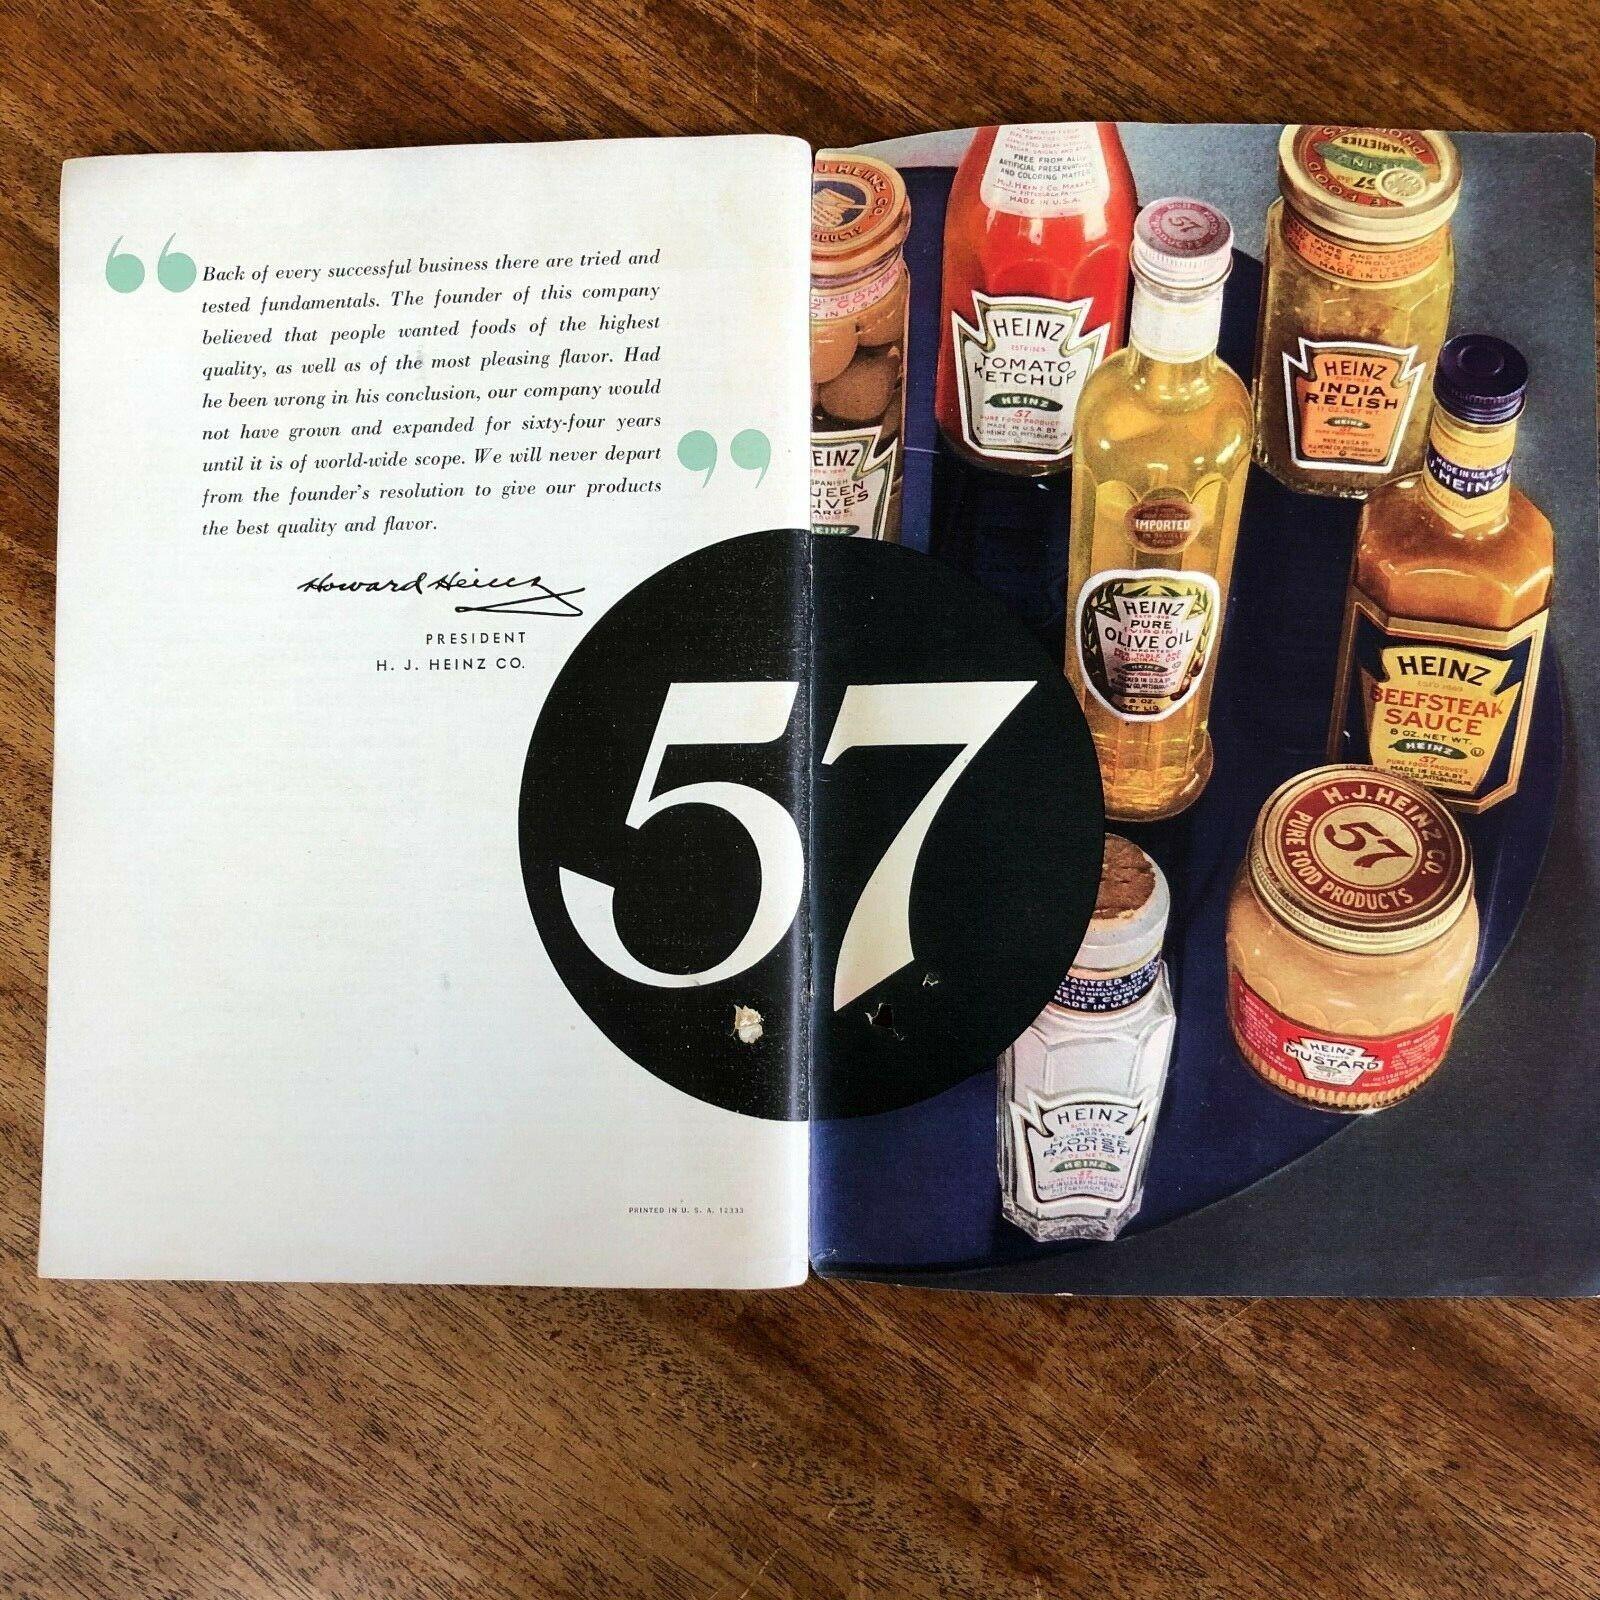 Heinz Salad Book Advertising Recipes Brochure 1940s Vintage H J Heinz Company In 2020 Book Advertising Ebay Vintage